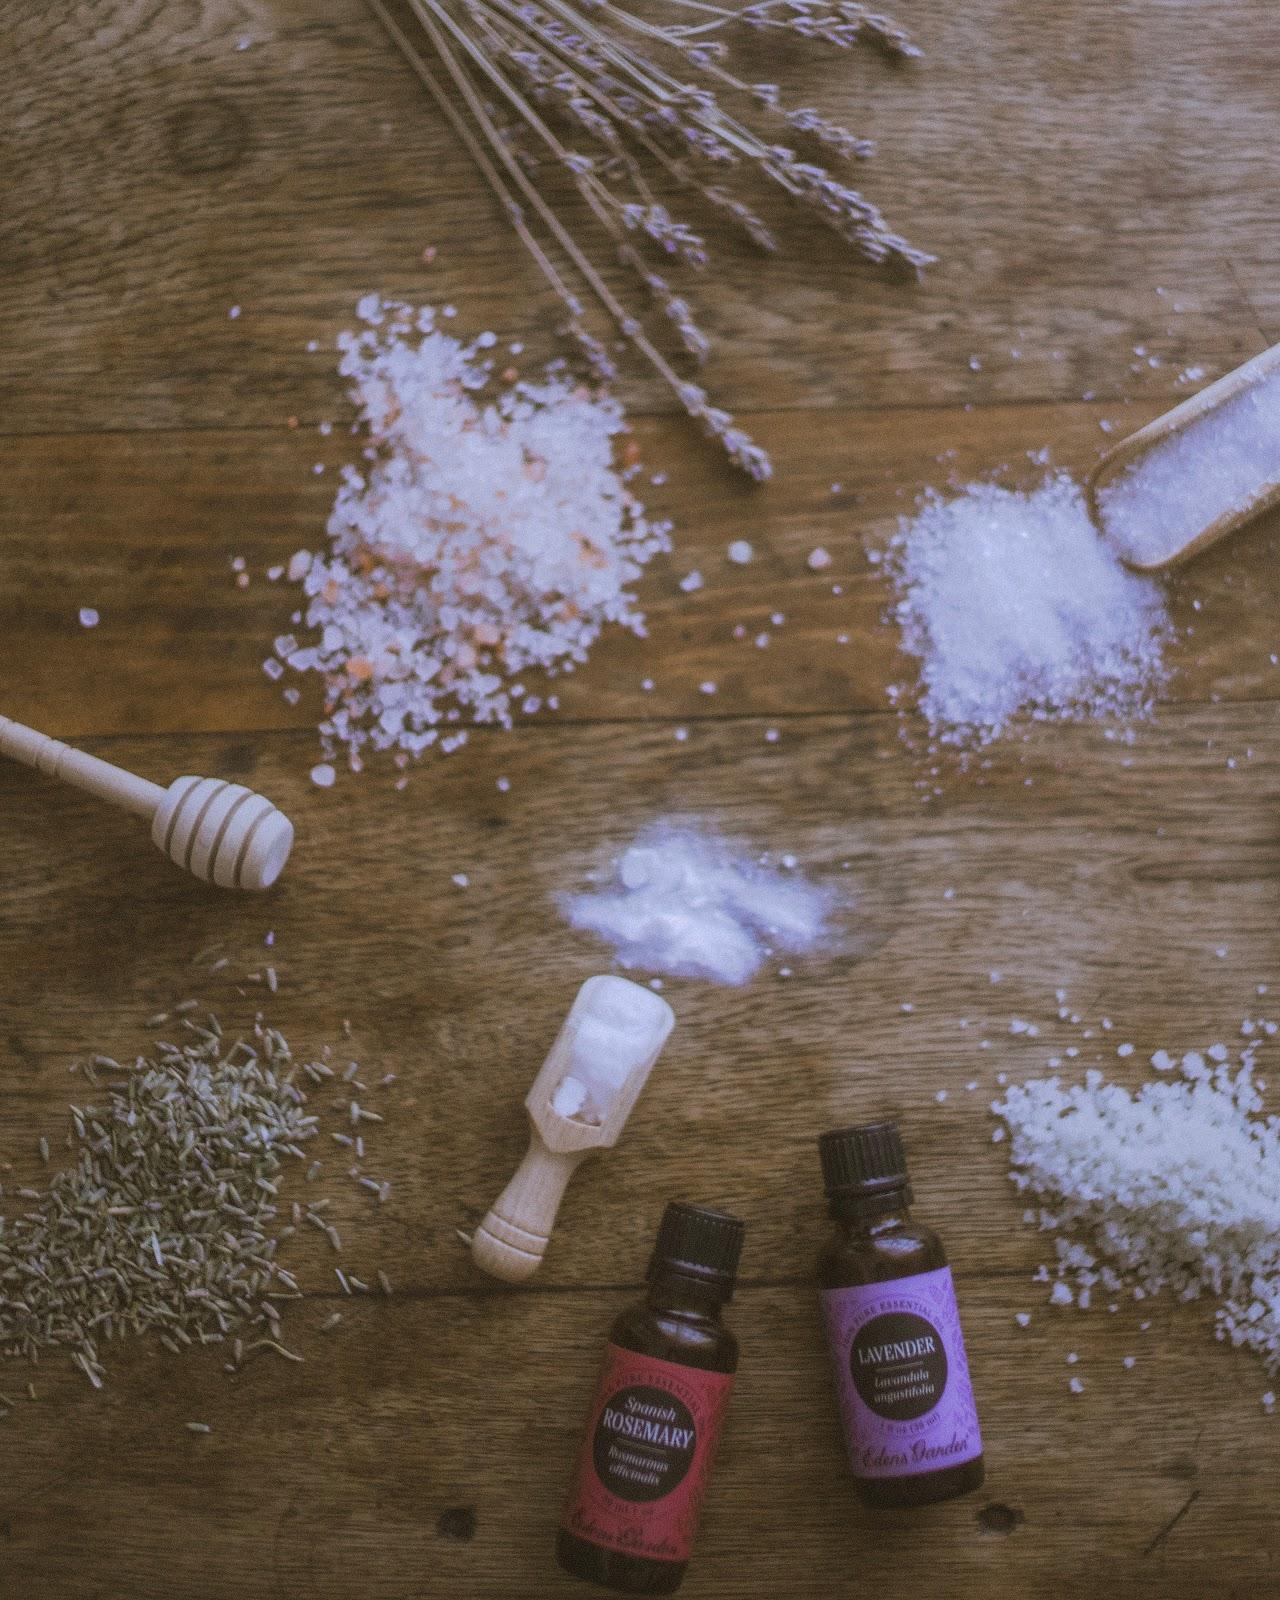 edens garden essential oils DIY bath salts